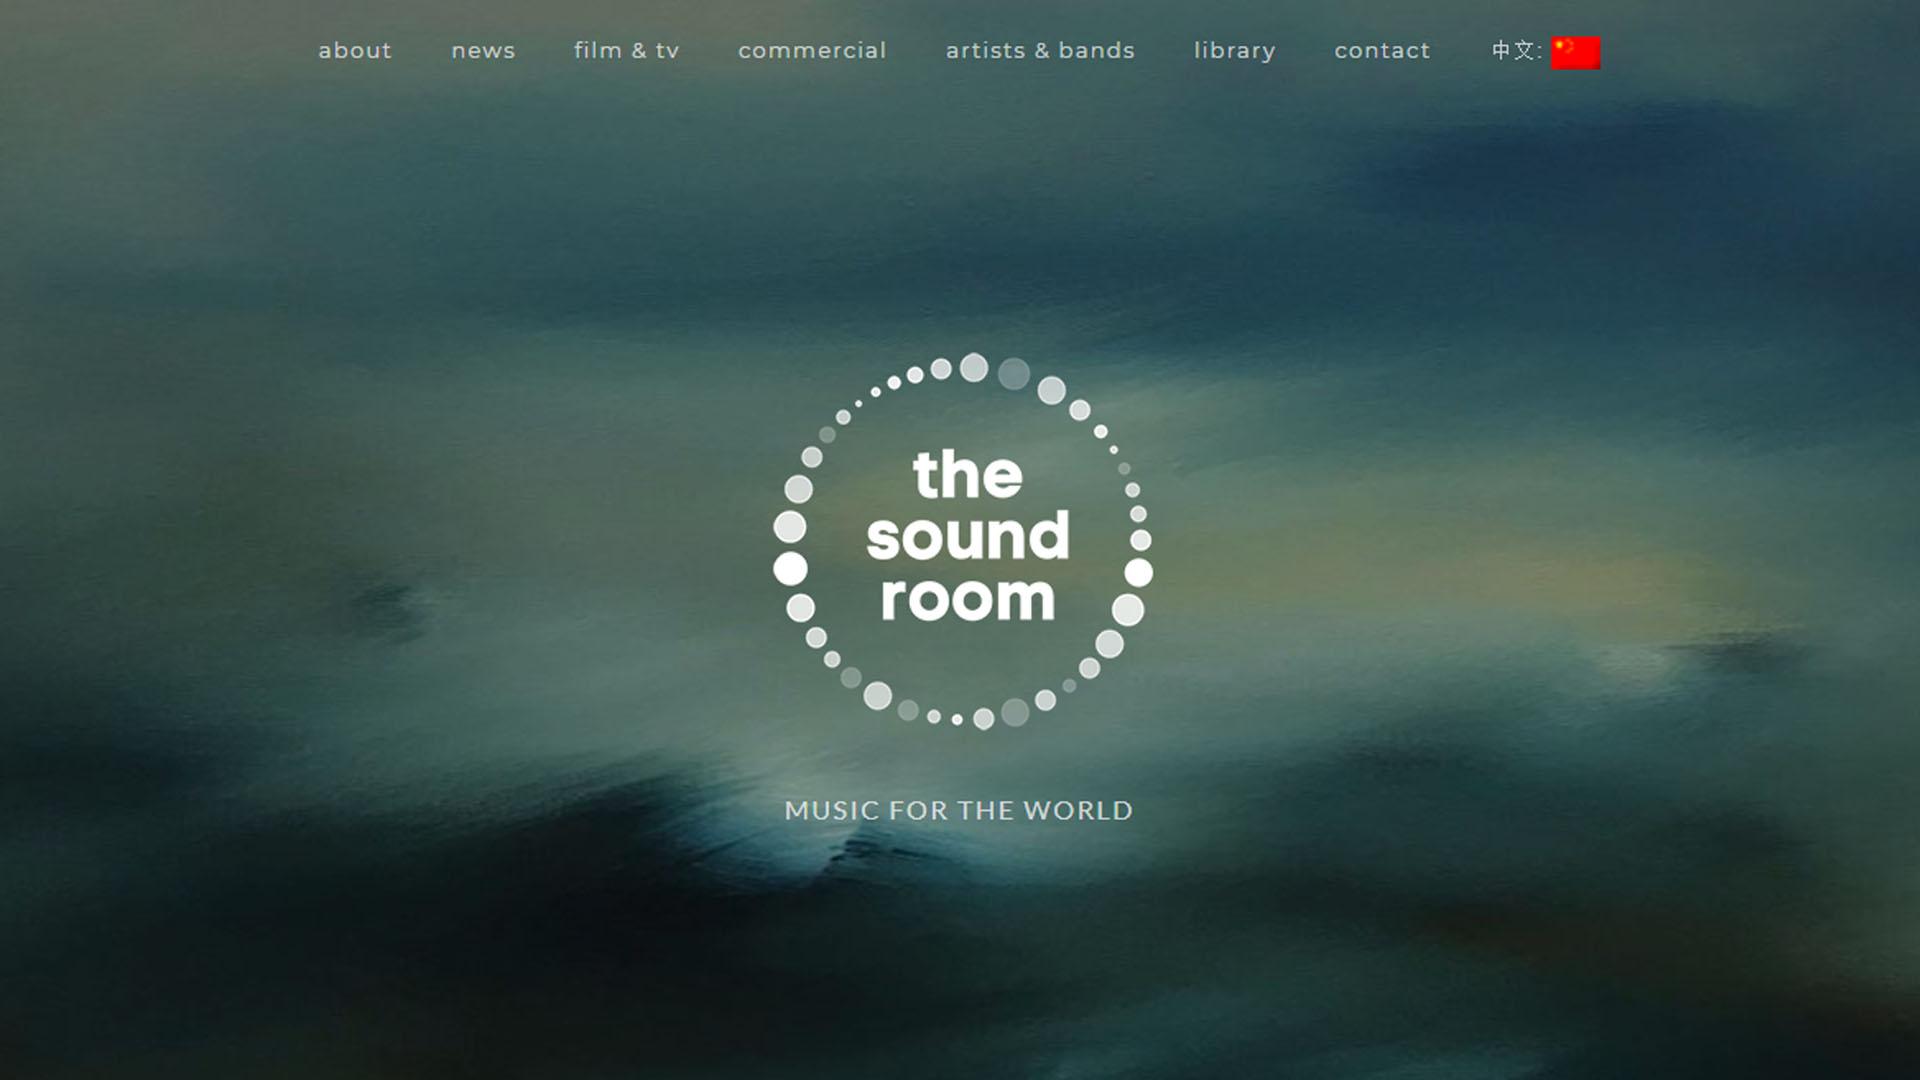 Soundroom.co.nz - website